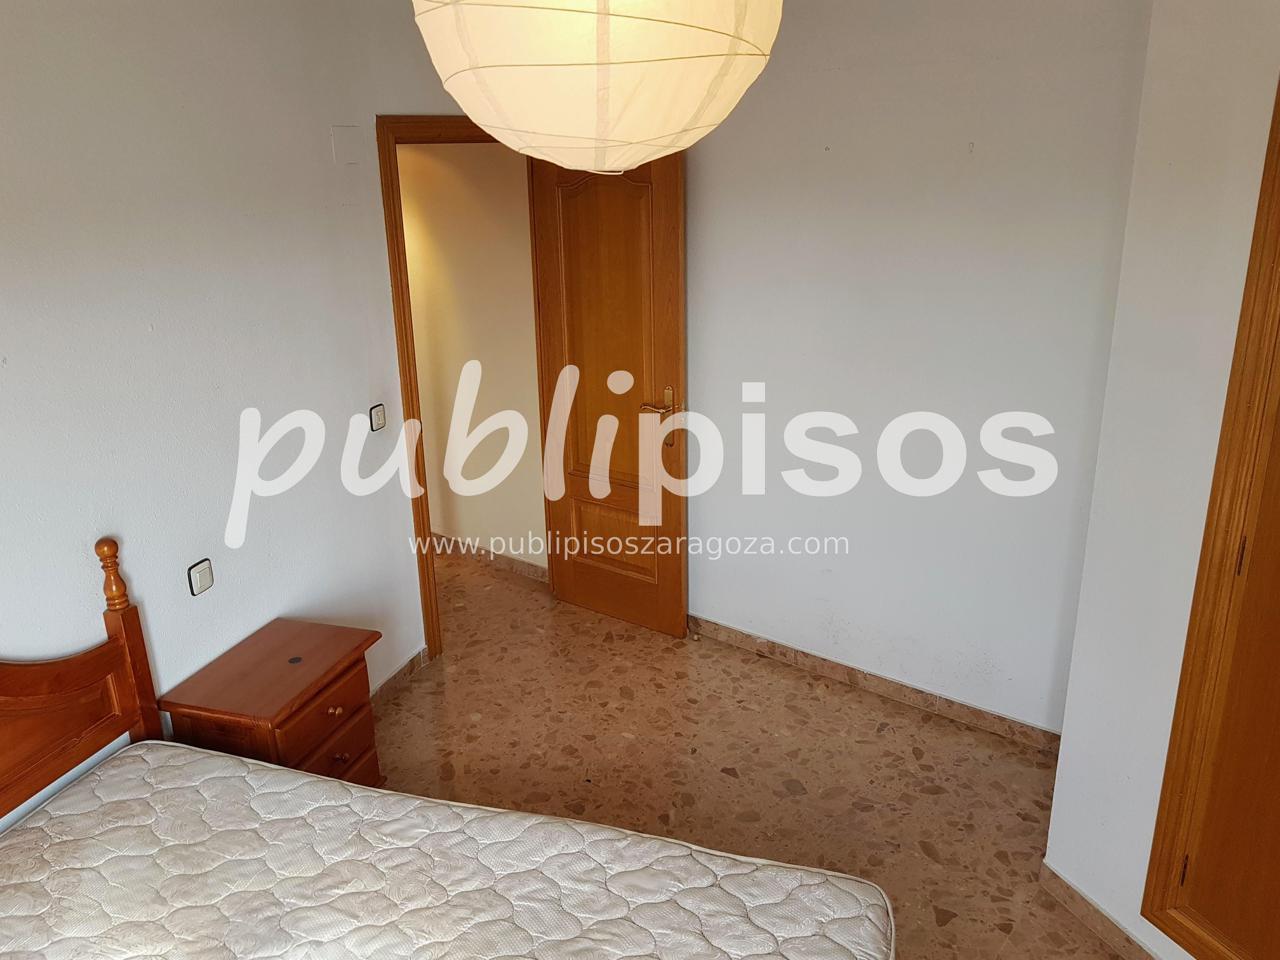 Piso alquiler con garaje Plaza del Pilar-27